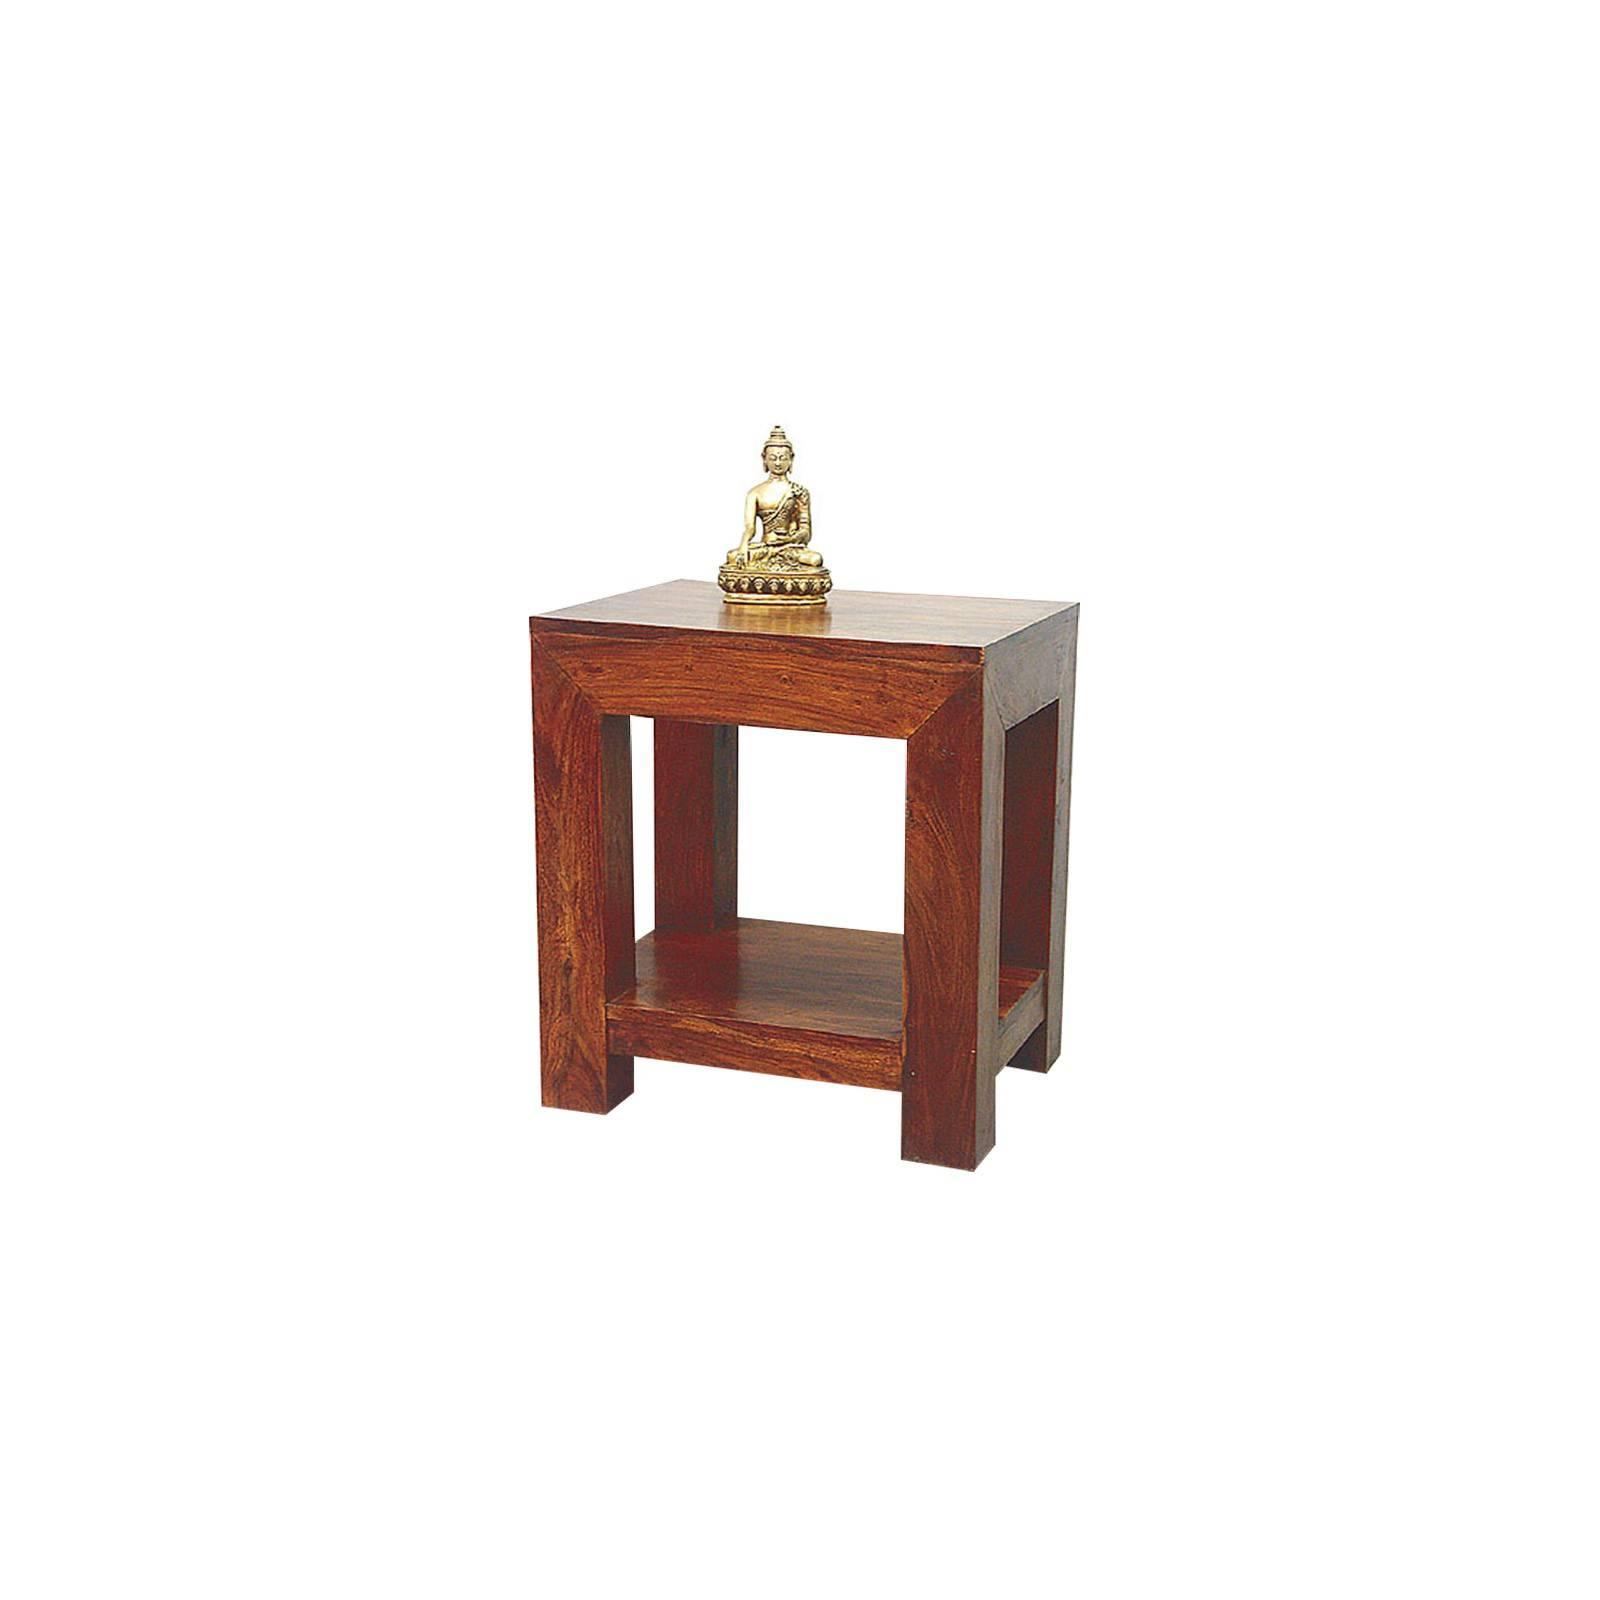 Chevet Palissandre Zen en bois massif